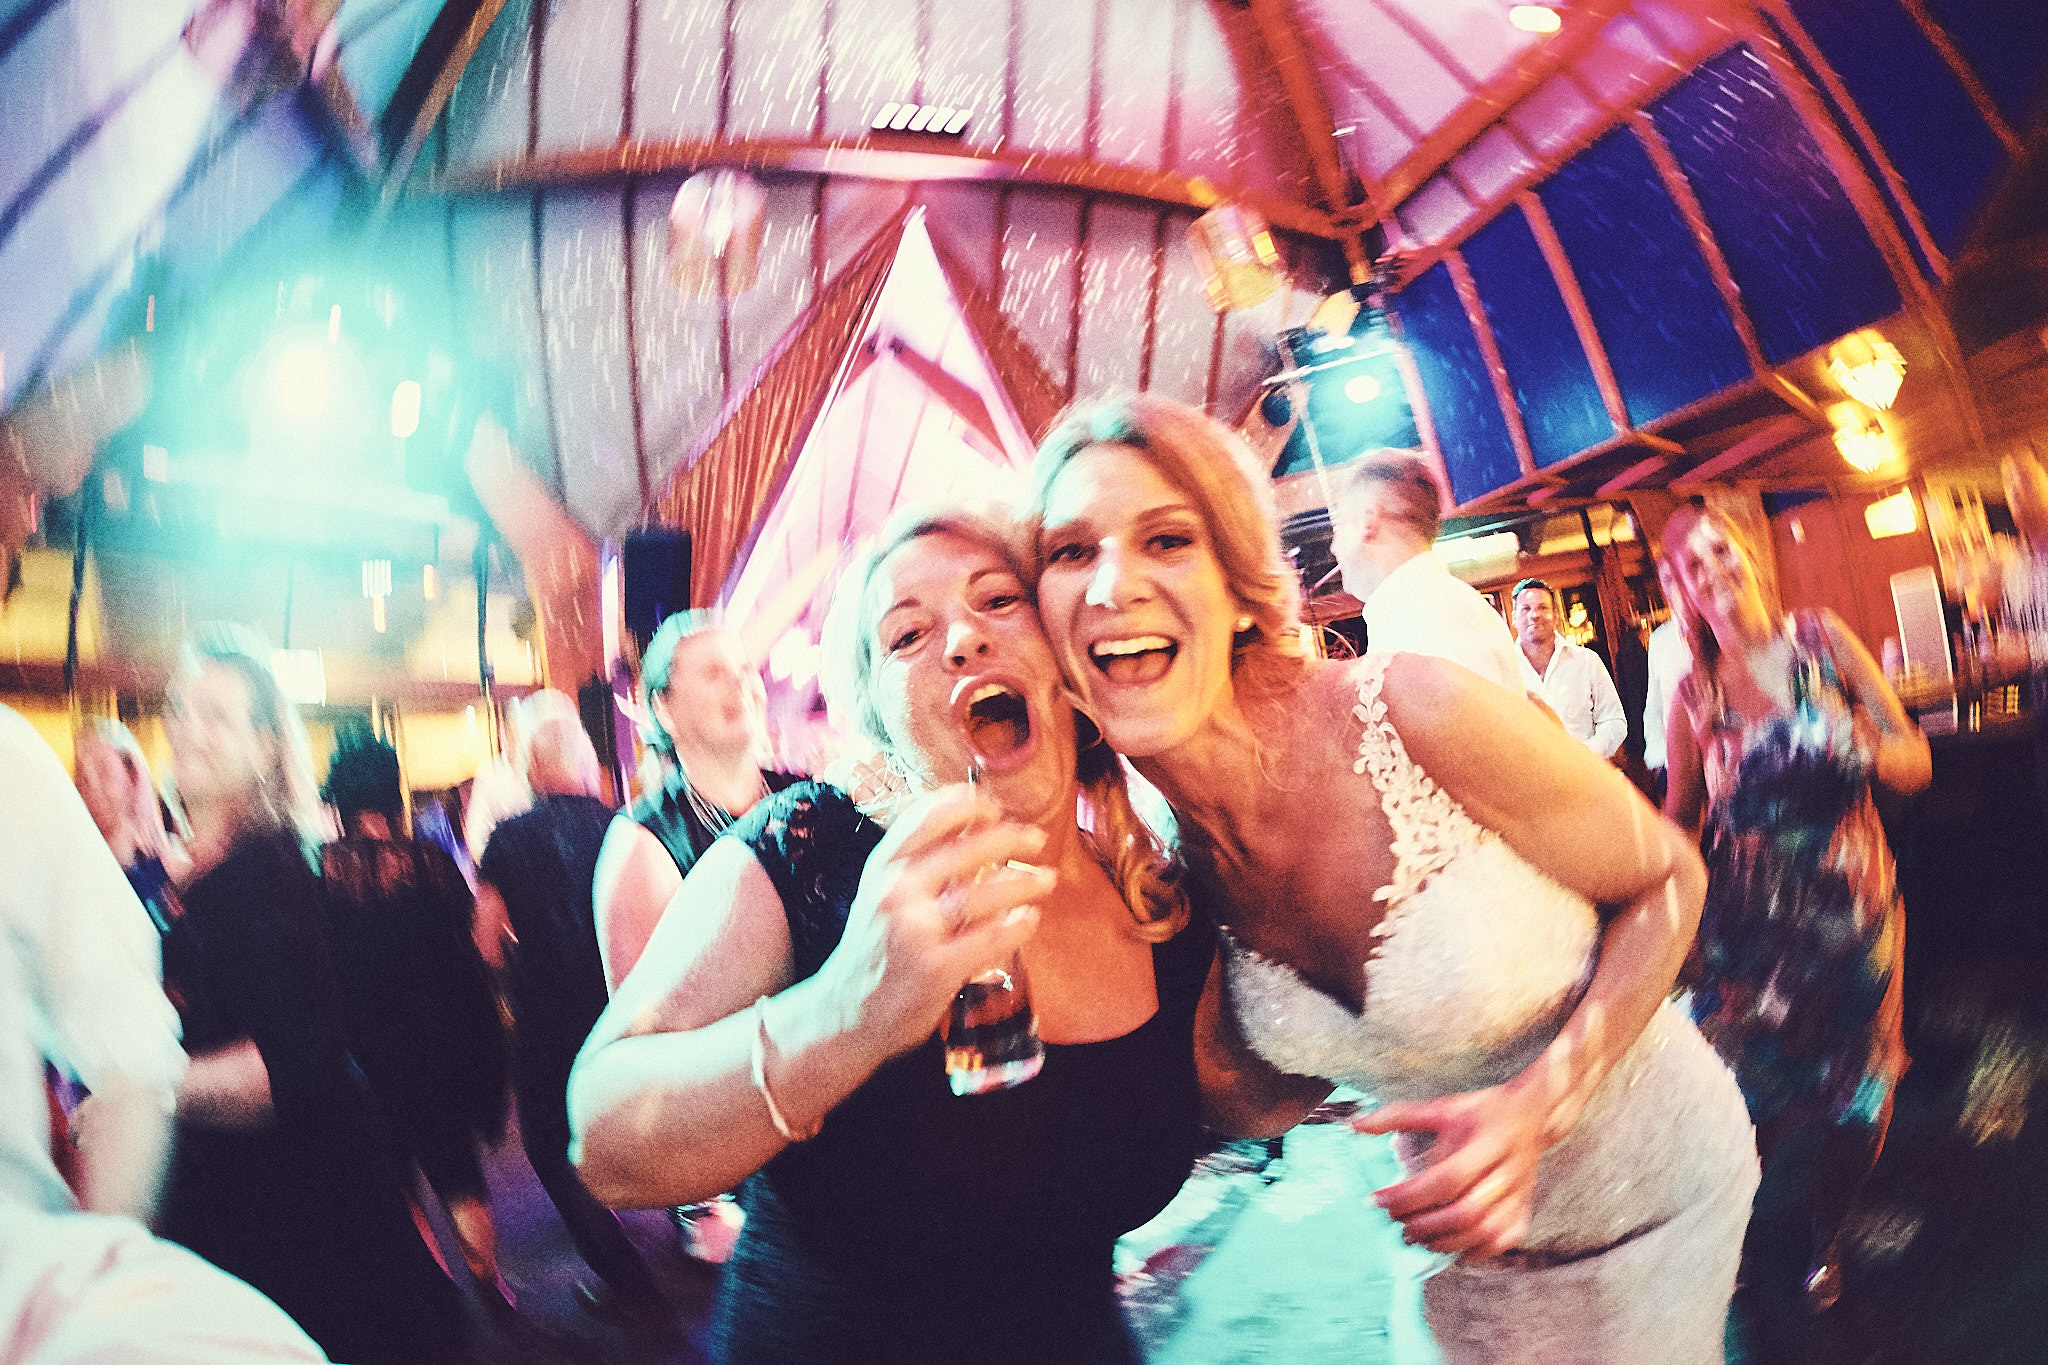 bruidsfotografie-trouwreportage-Delft-Ingrid-Richard_1451.jpg